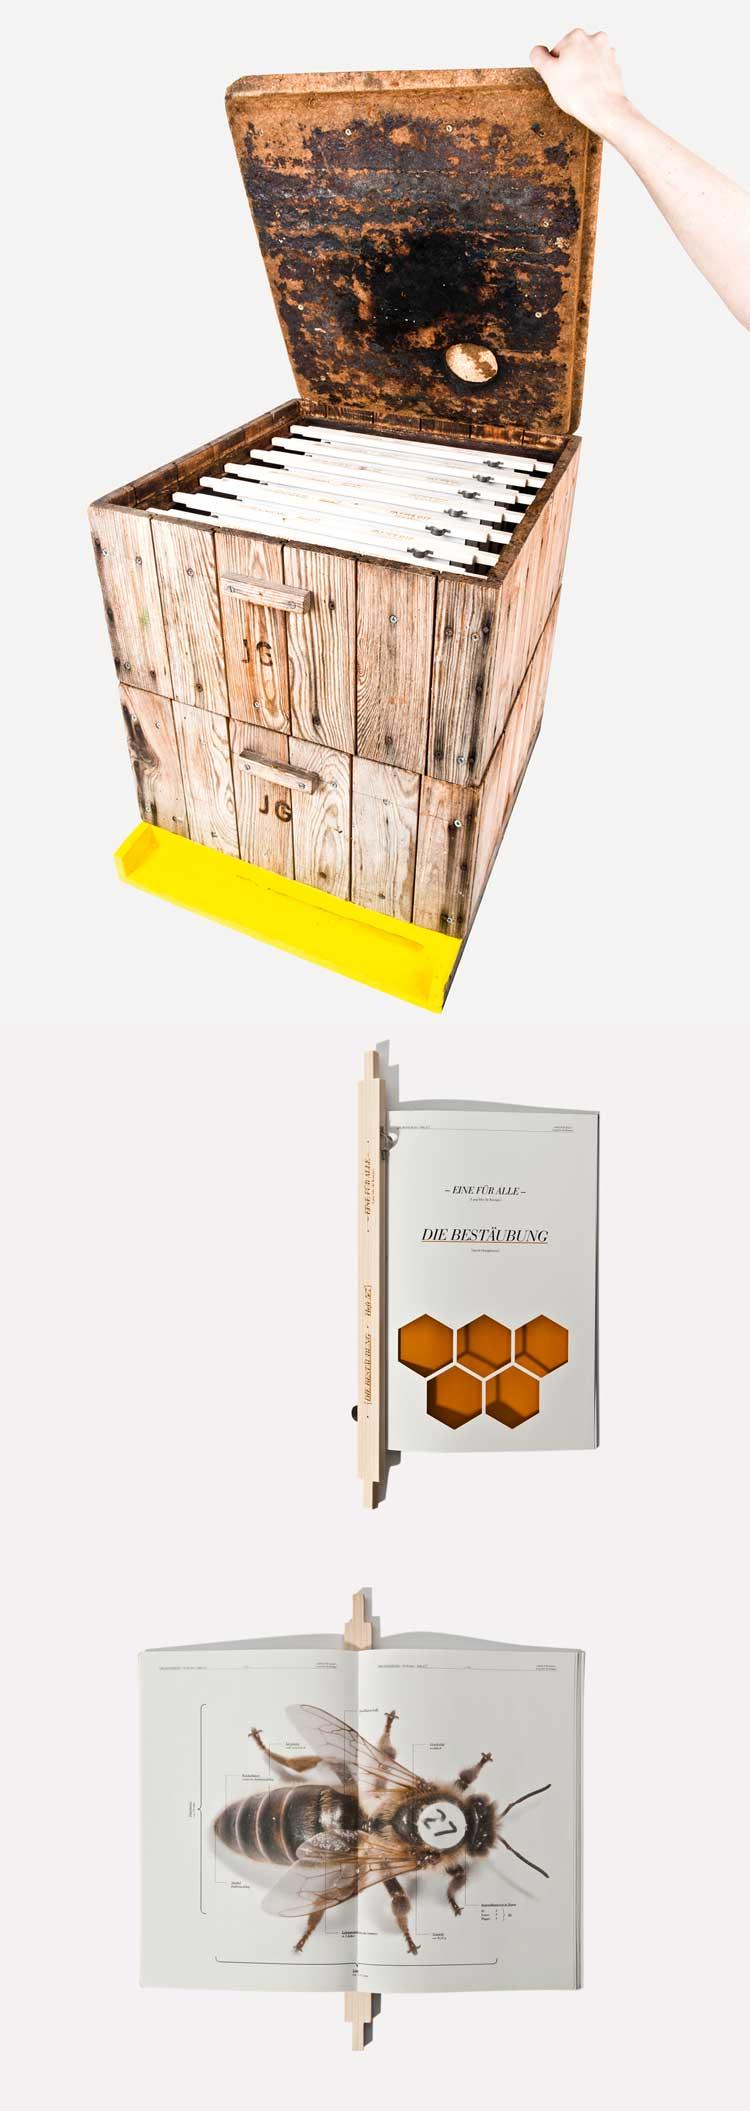 experimental formats honey project